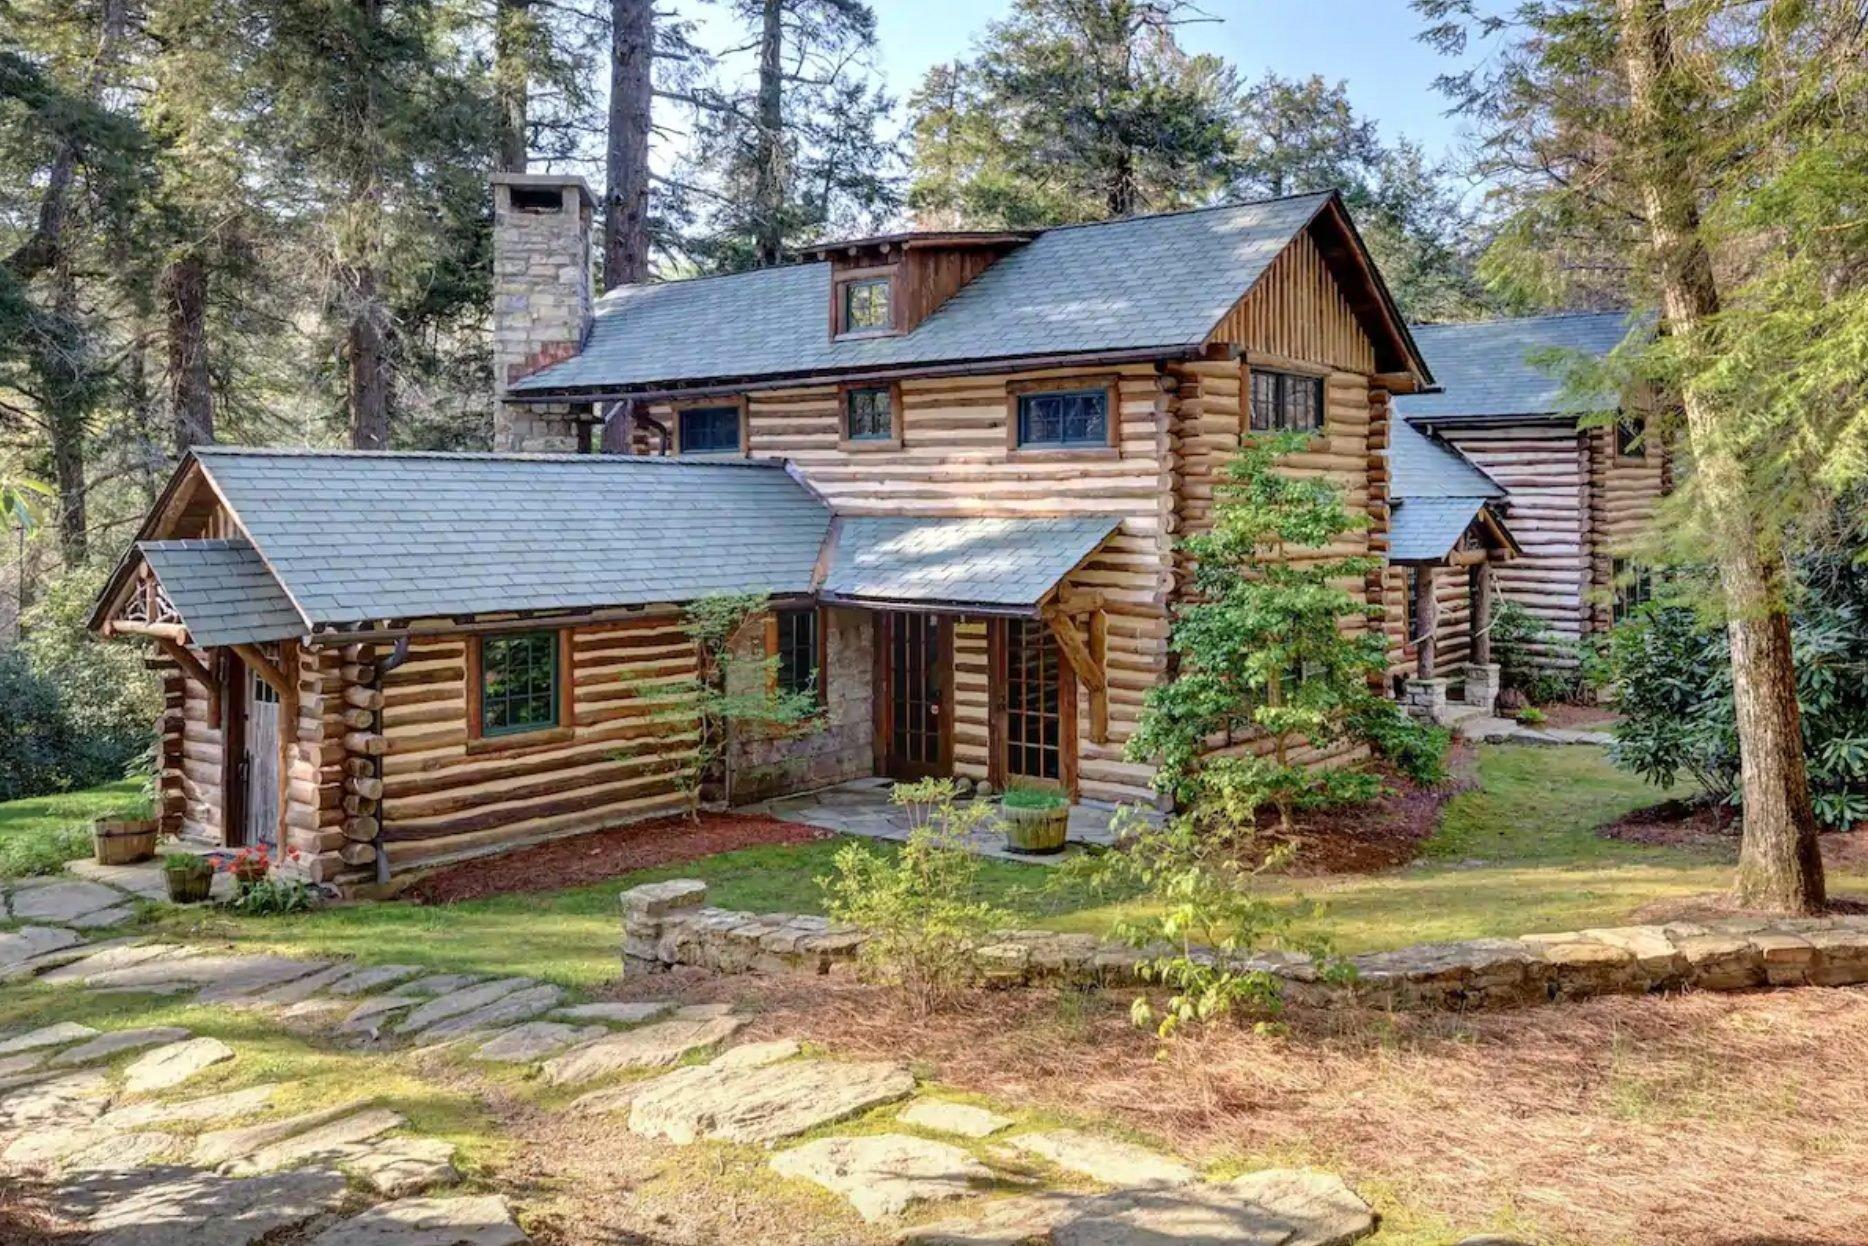 Big Billy Cabin, in Highlands, North Carolina